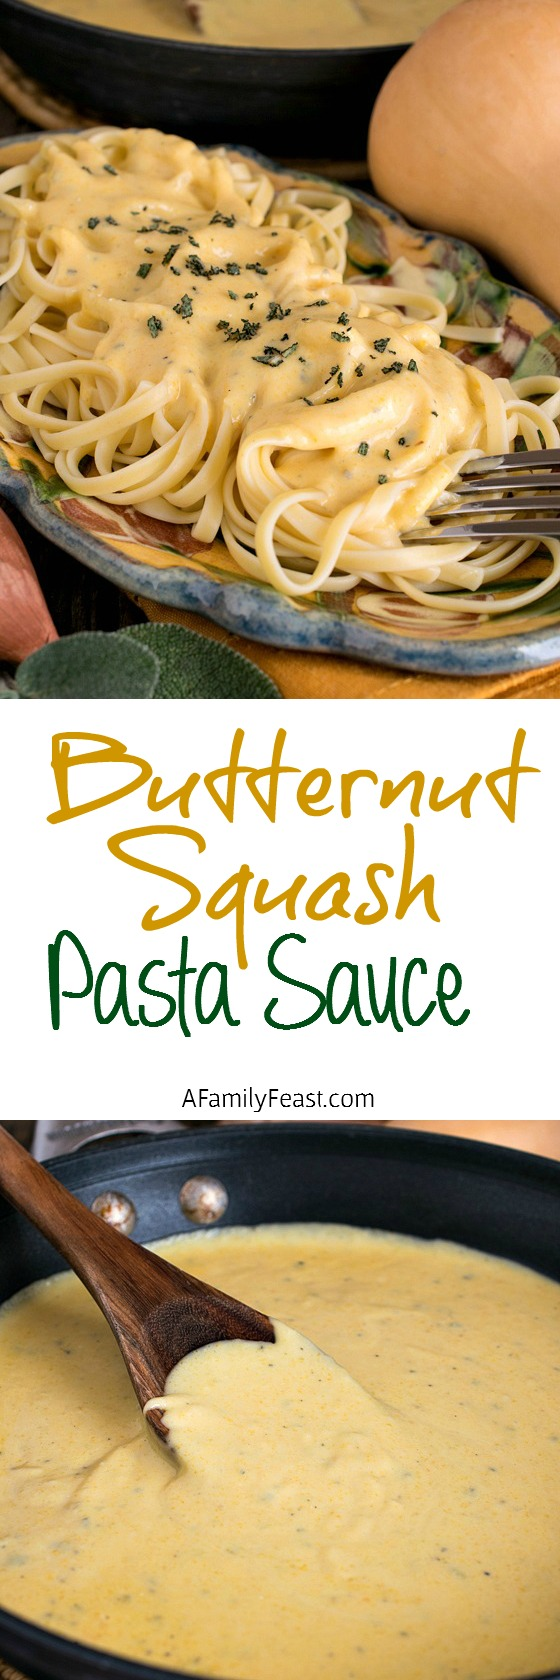 Butternut Squash Pasta Sauce - A Family Feast